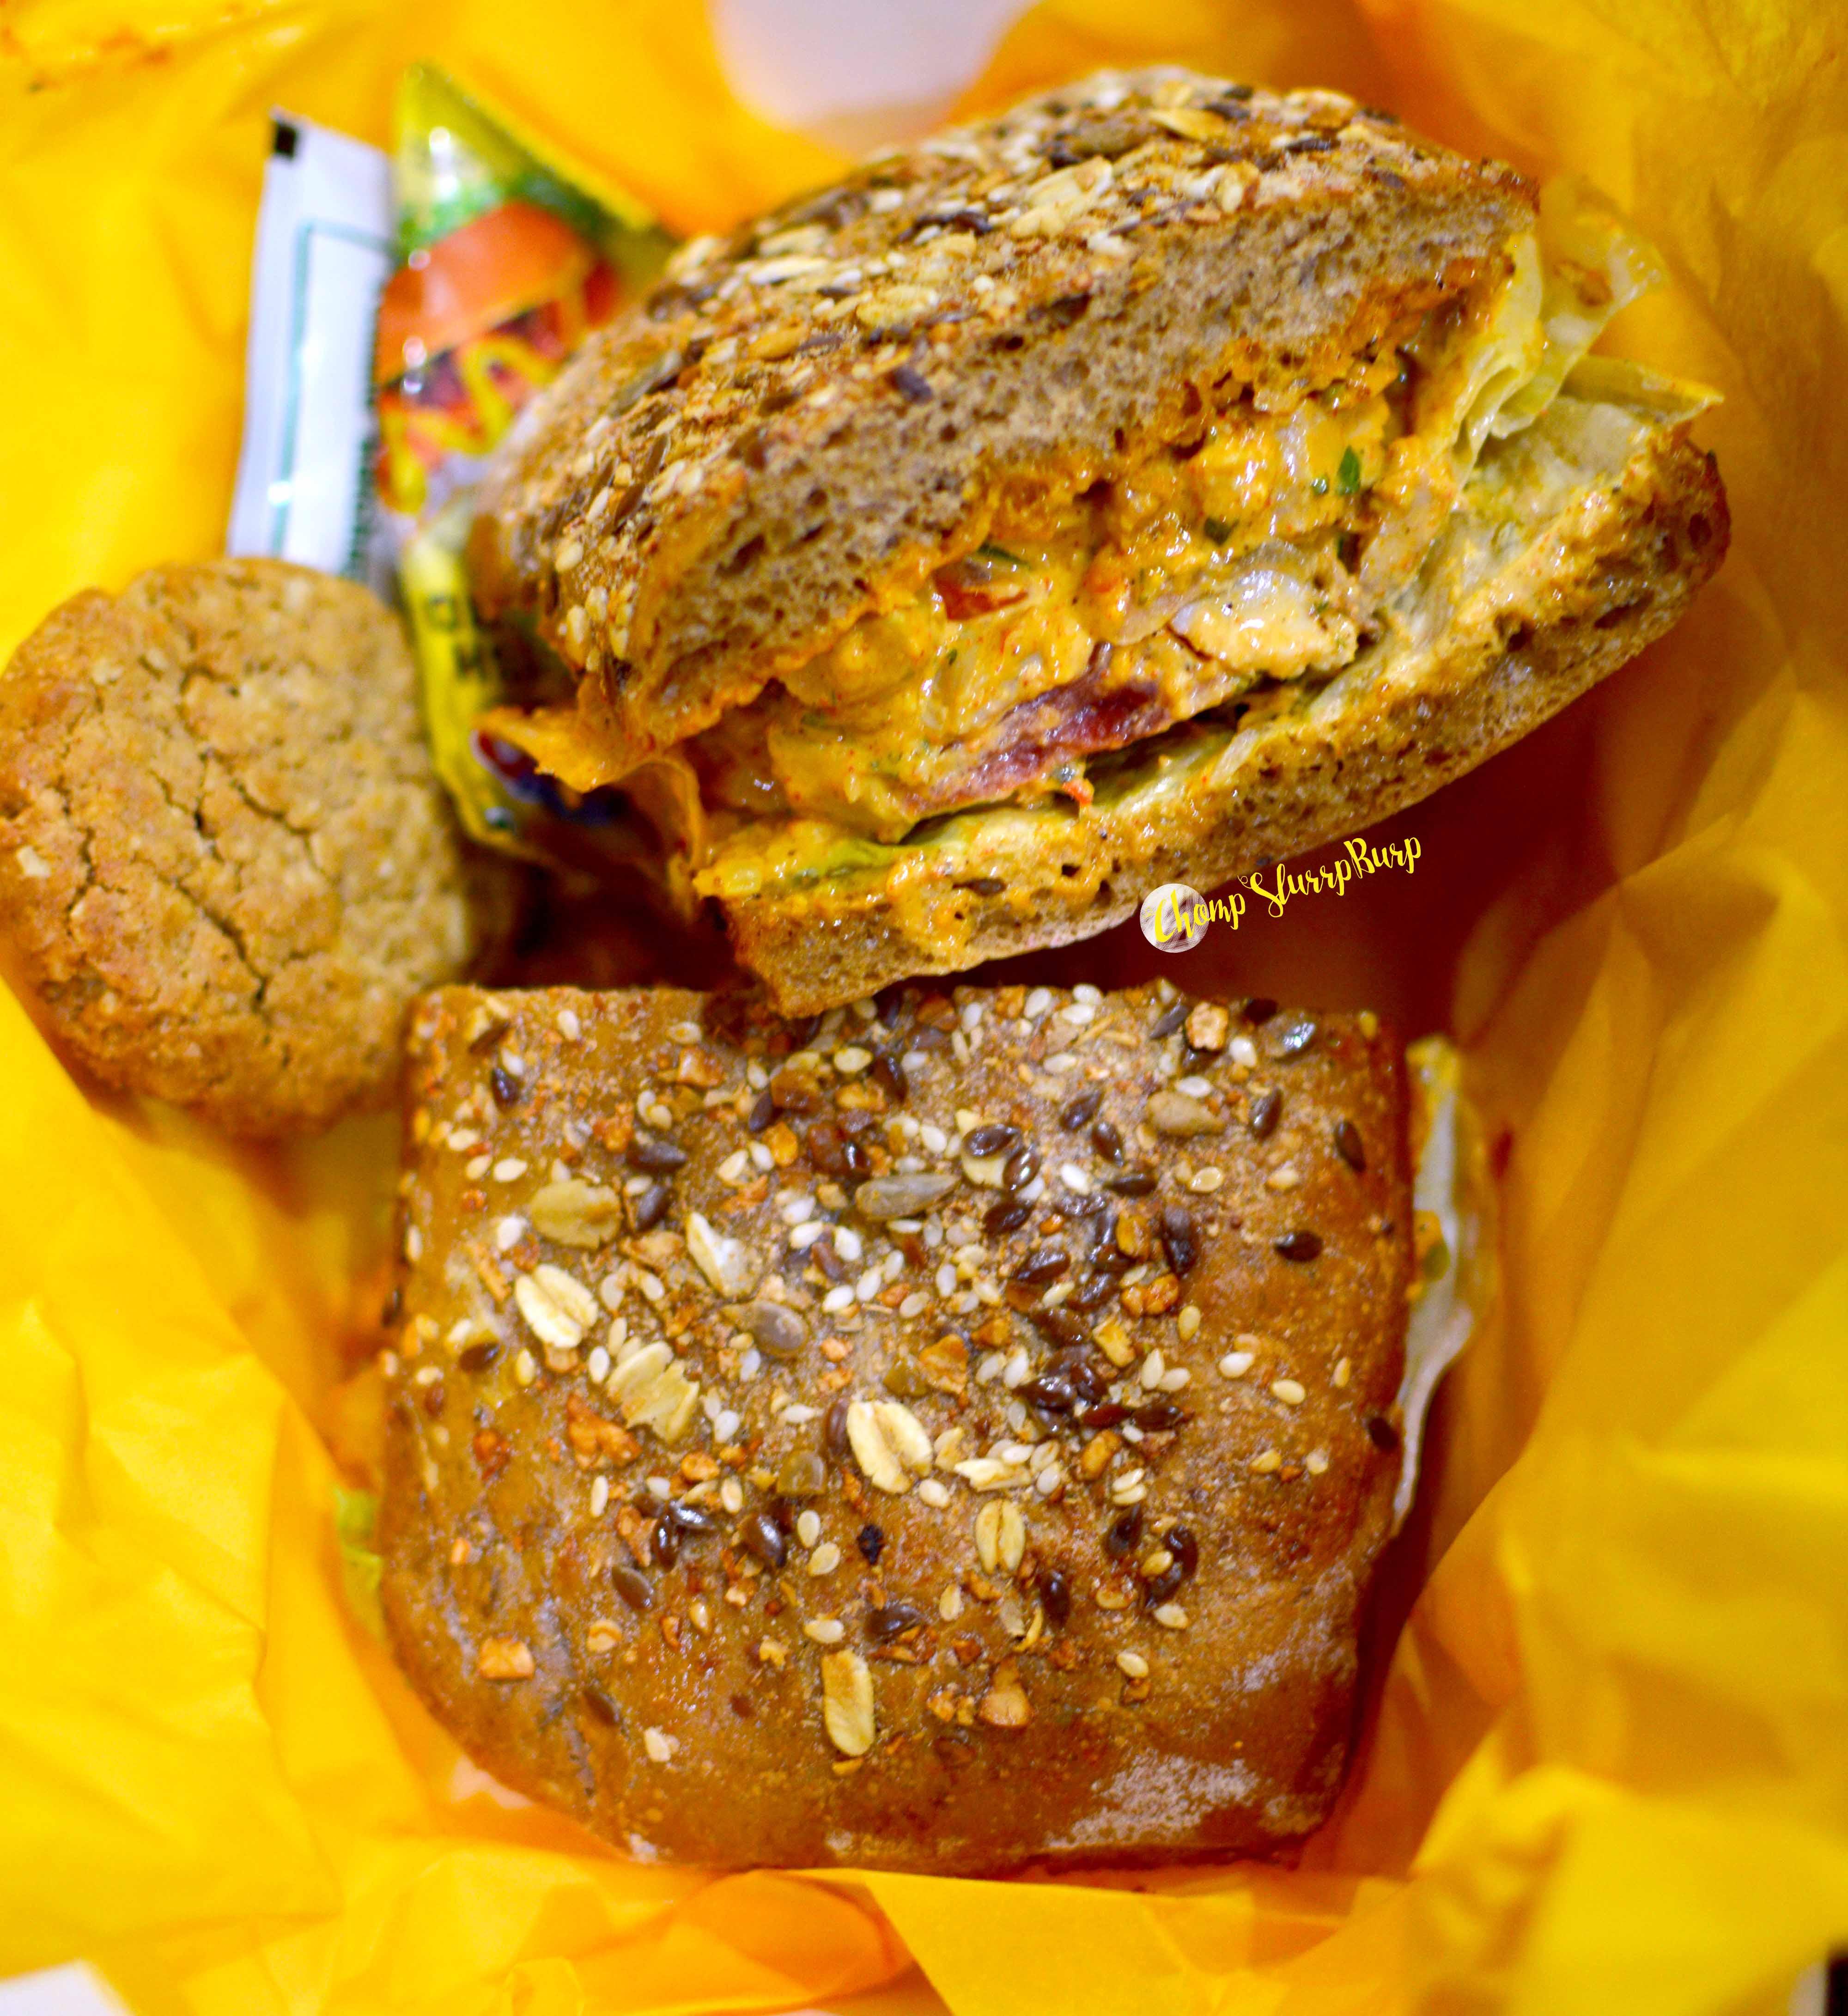 Sandwich from TWIGLY